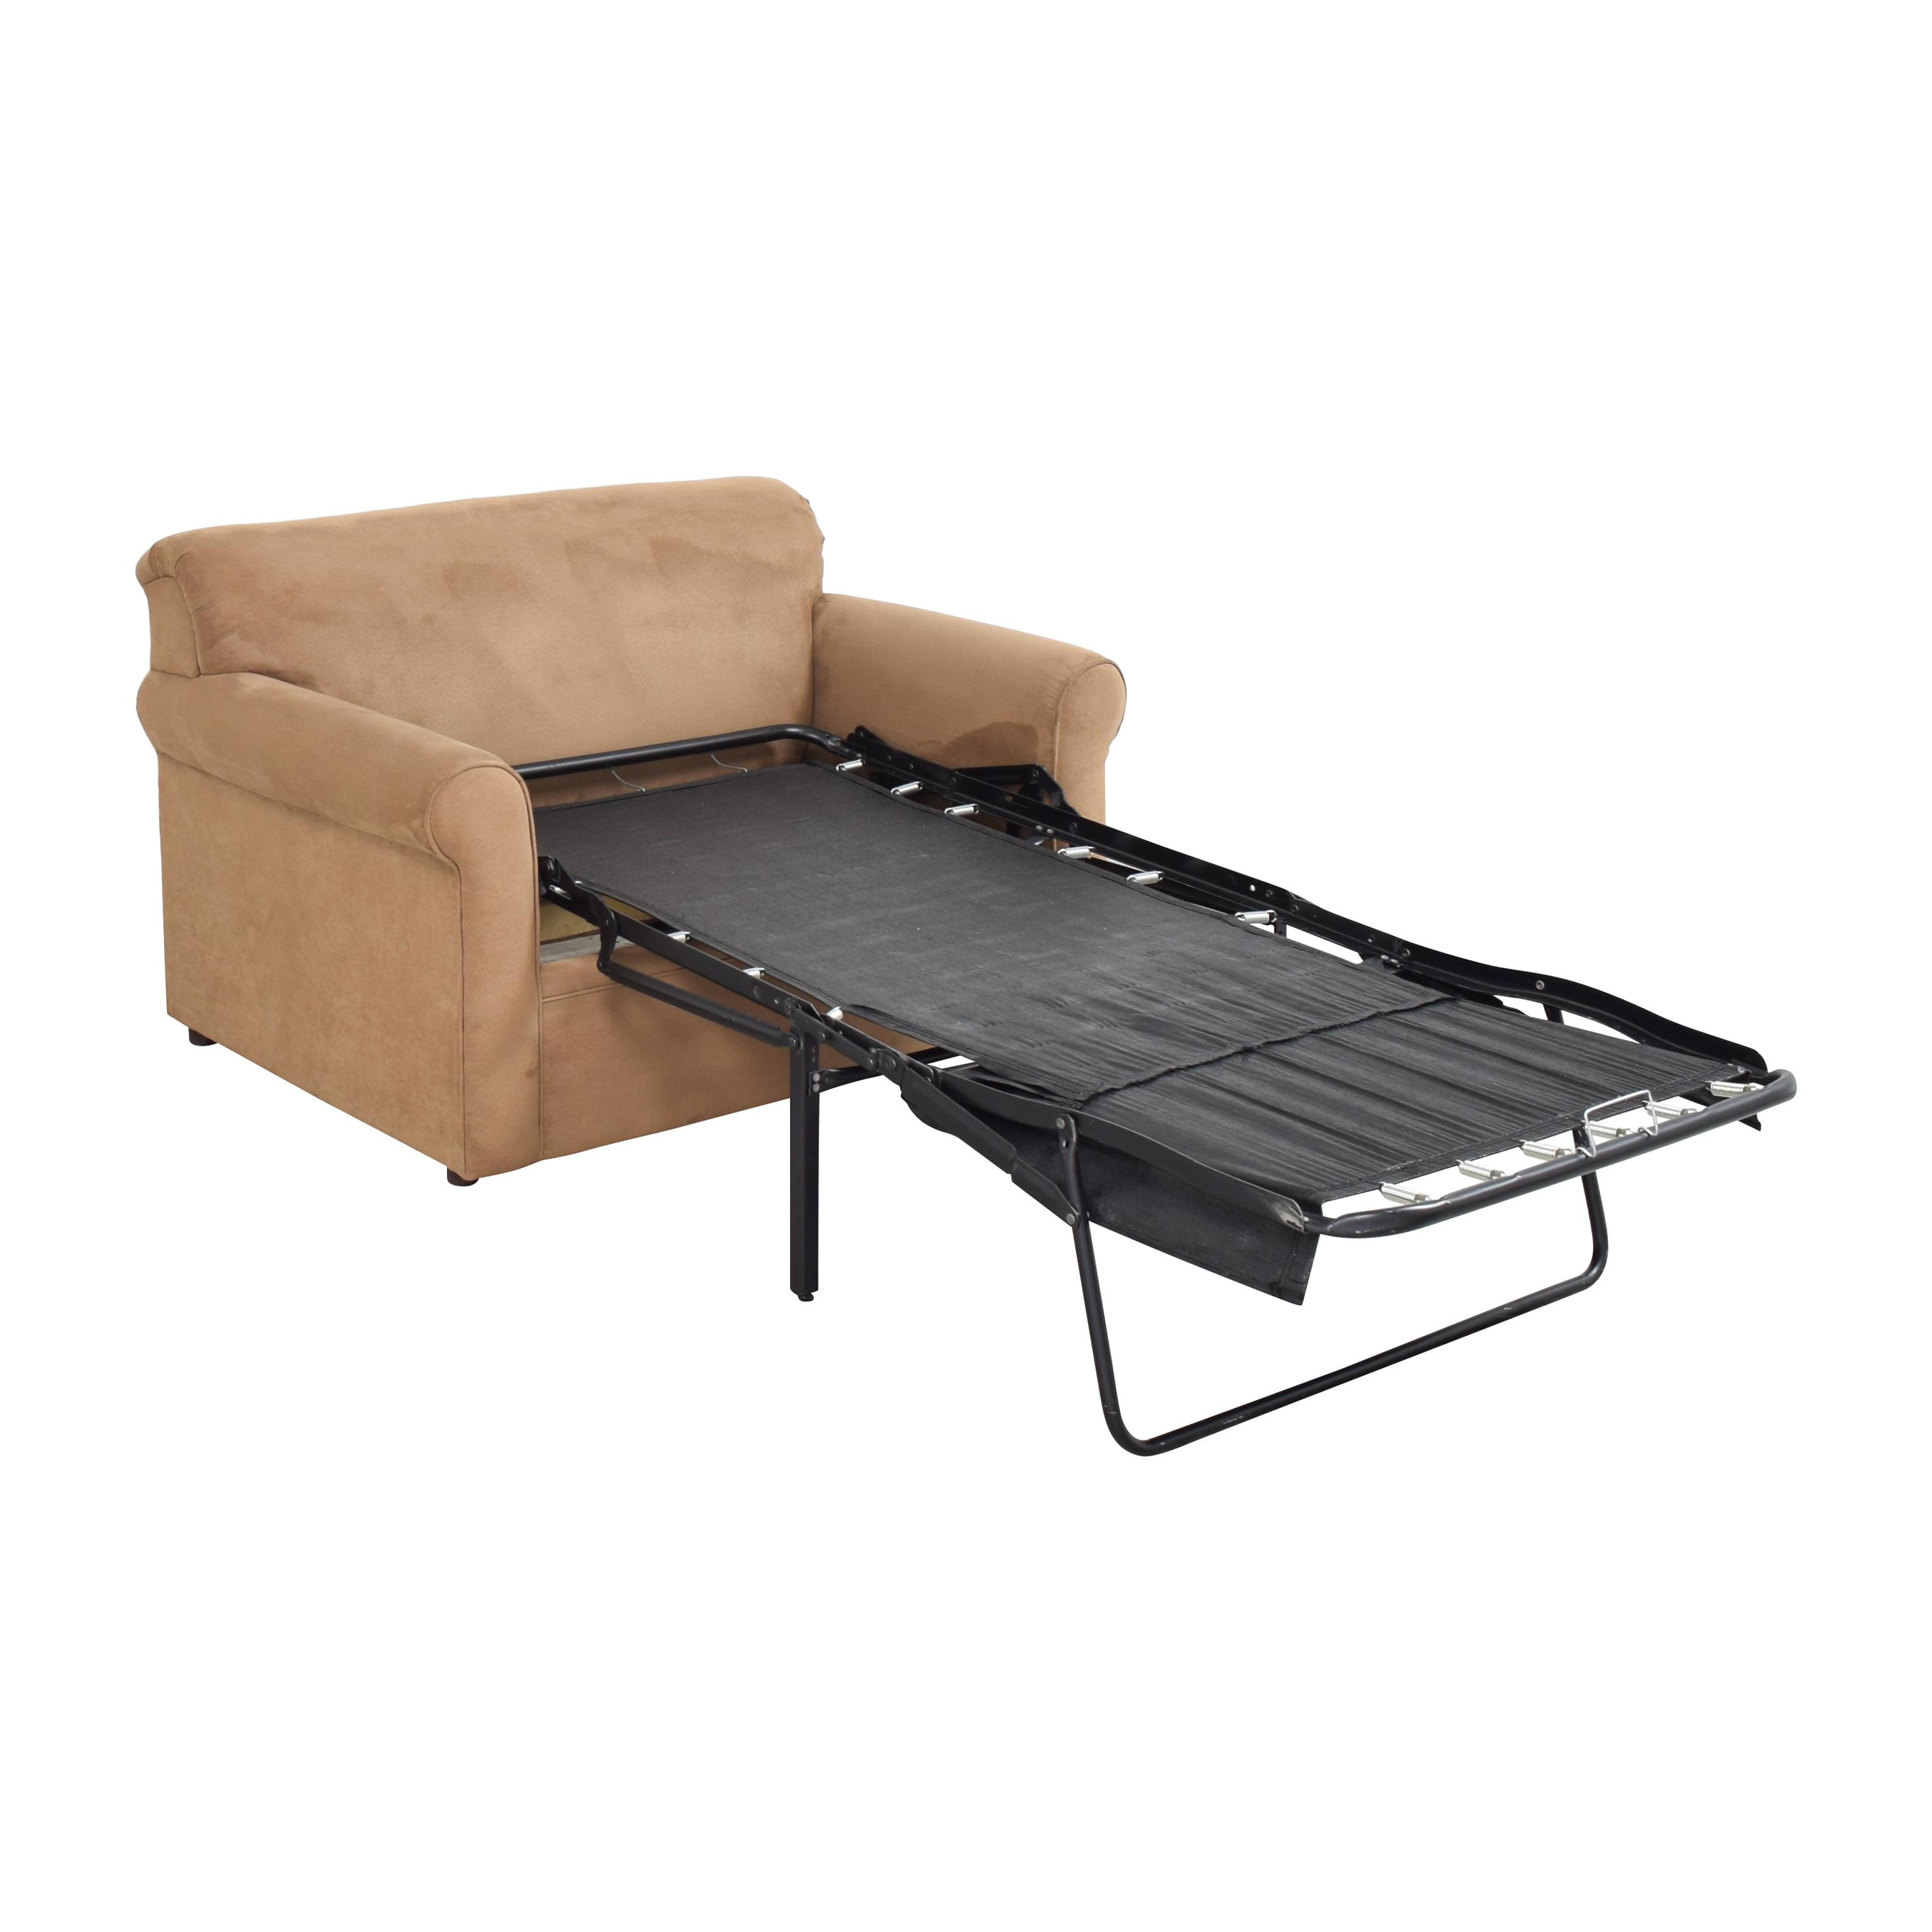 Overnight Sofa Sleeper Chair sale